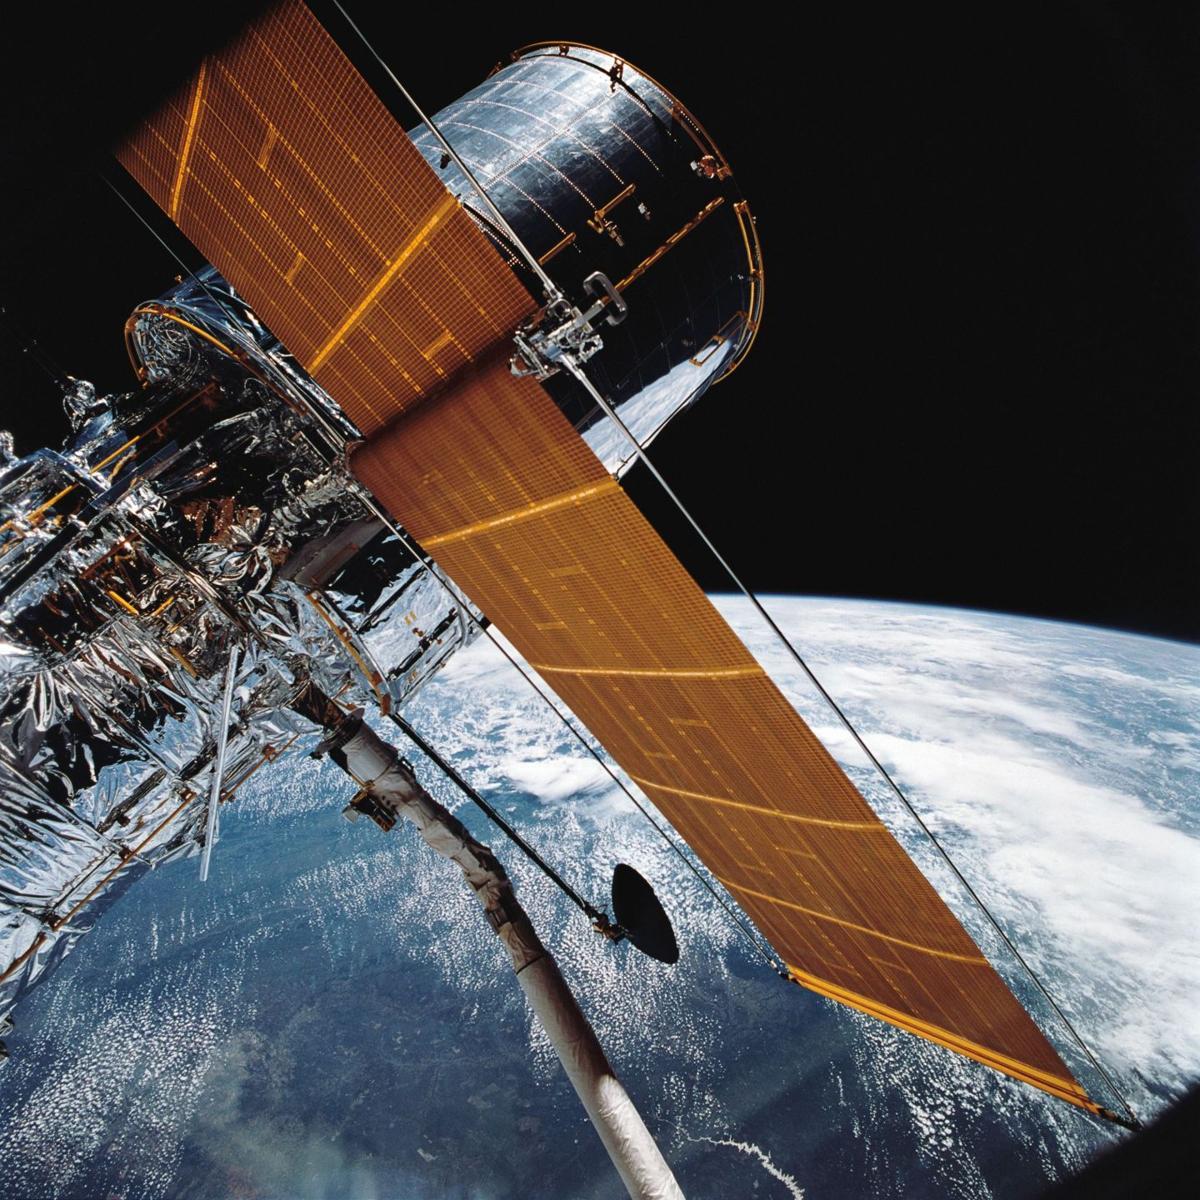 Hubble Space Telescope marks 25th anniversary in orbit